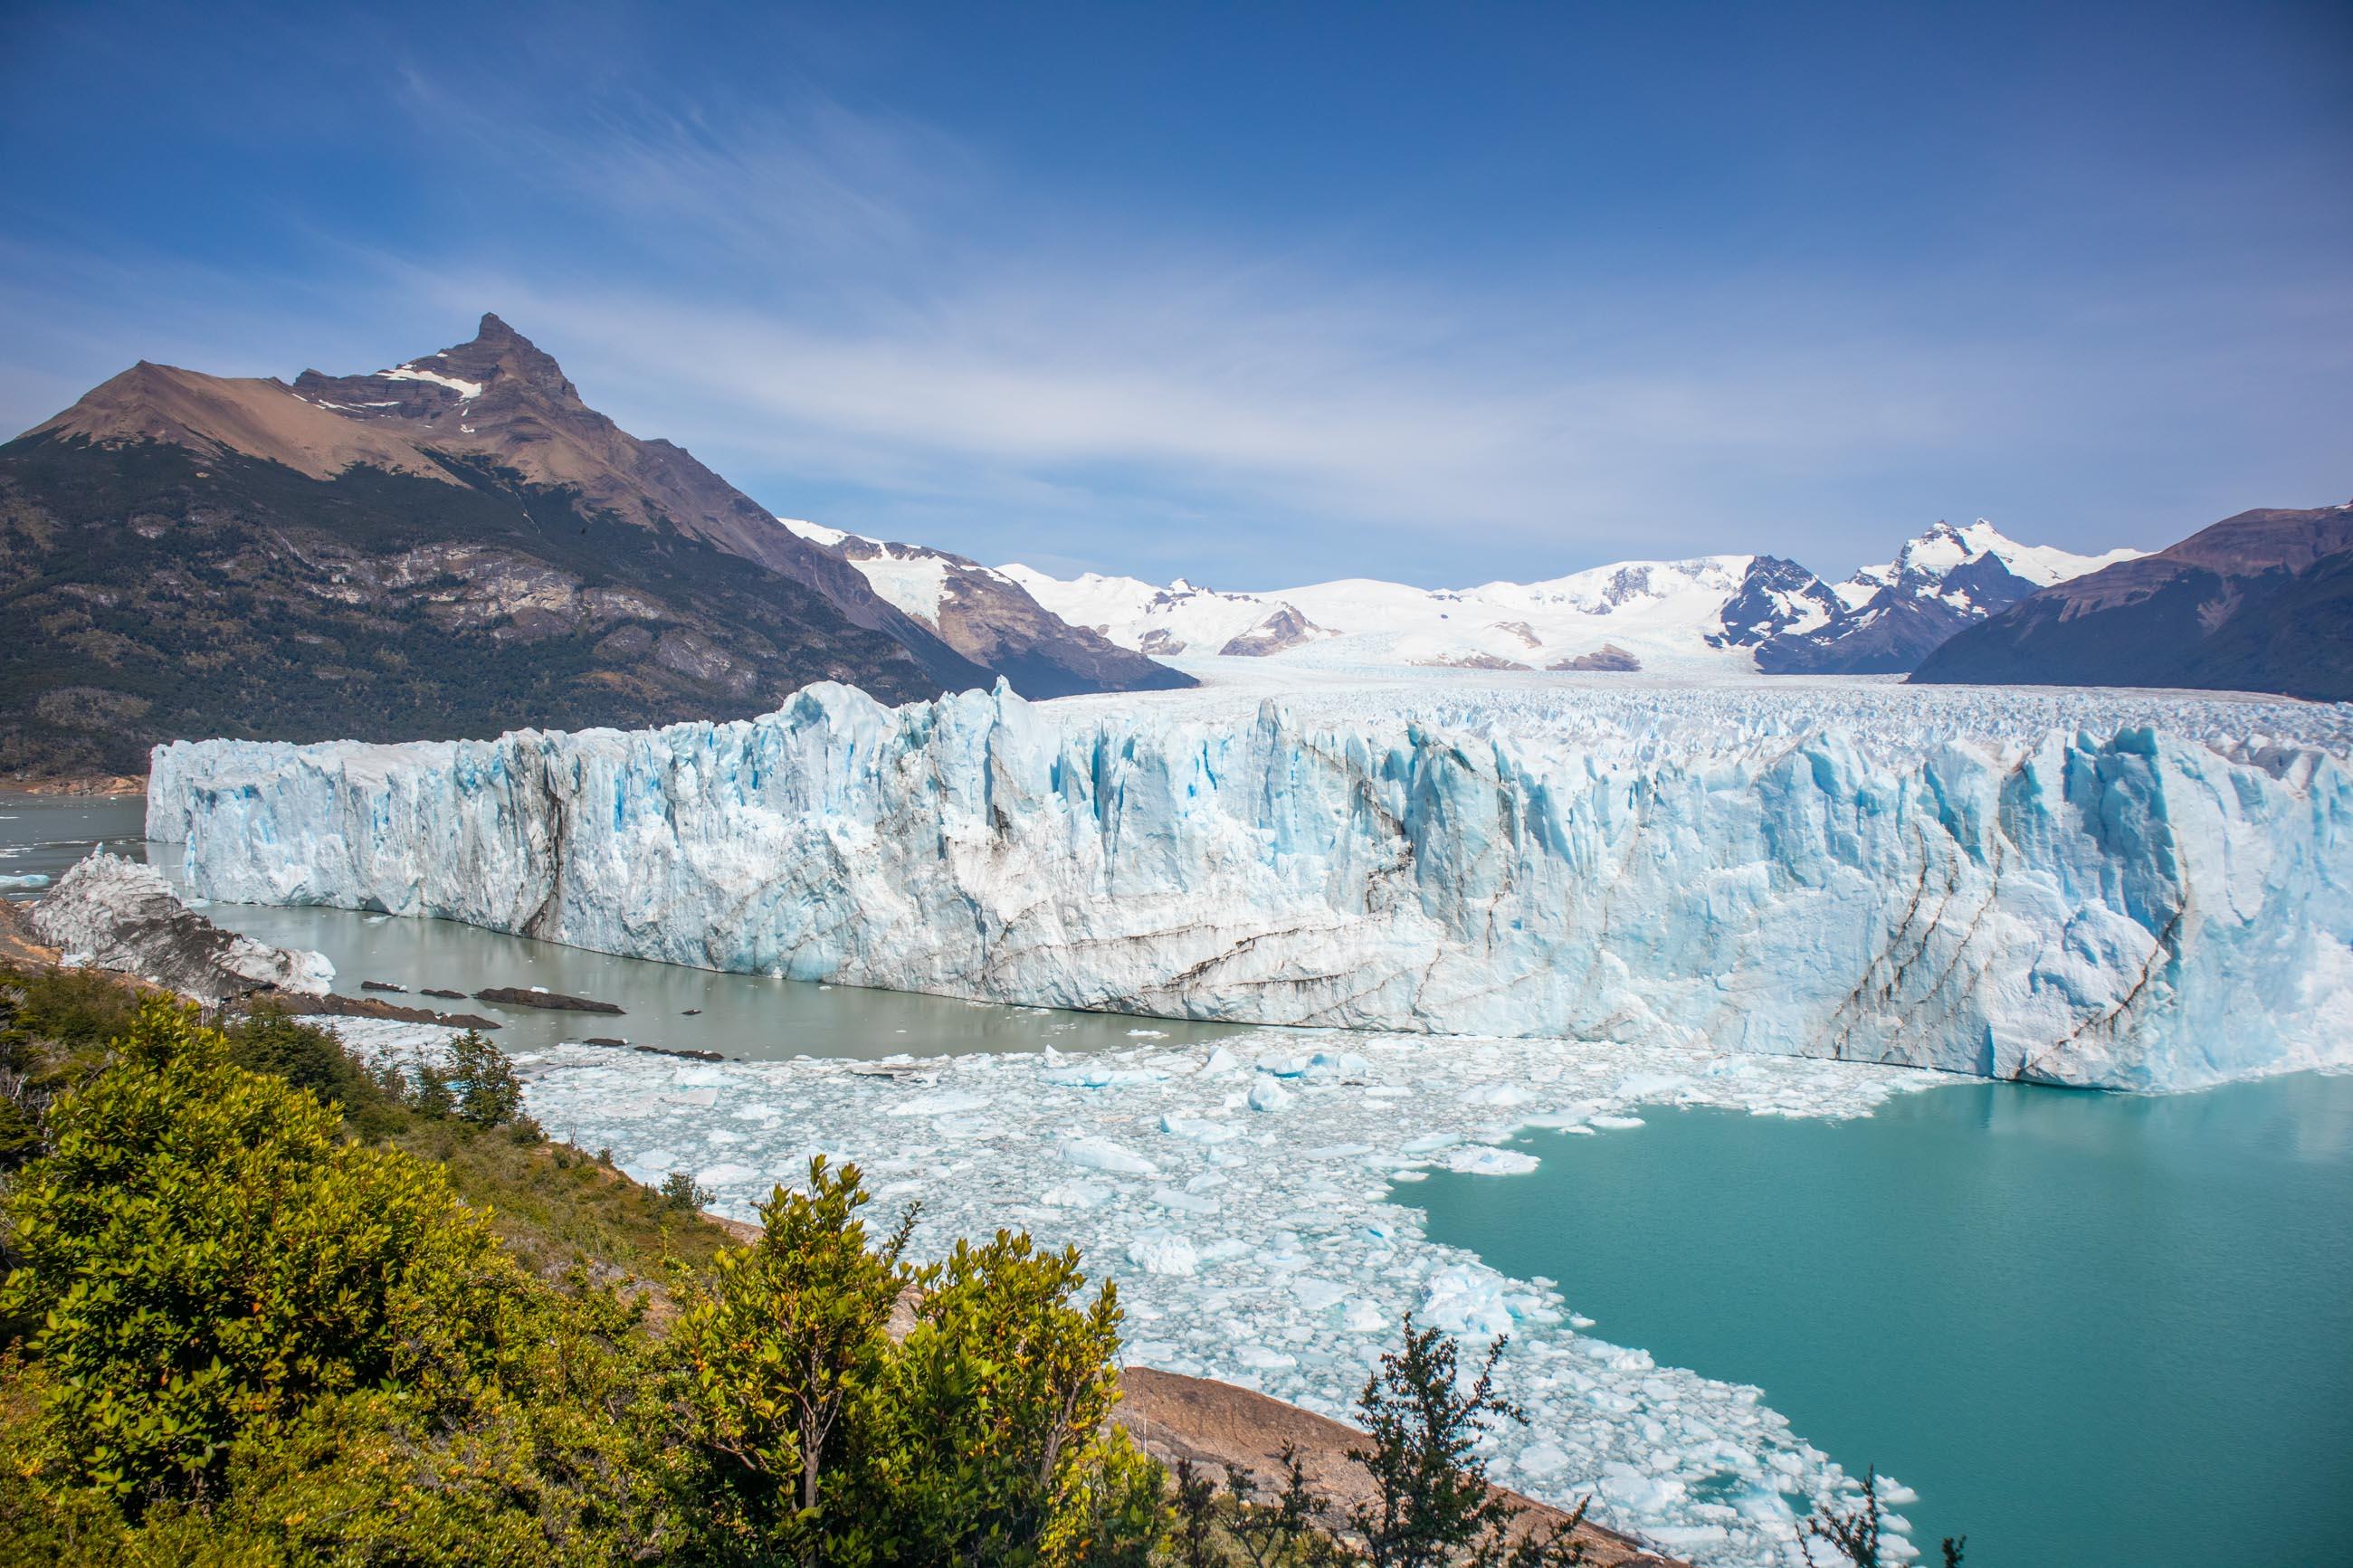 https://bubo.sk/uploads/galleries/7343/danielasnovakova_patagonia_argentina_img_3856.jpg